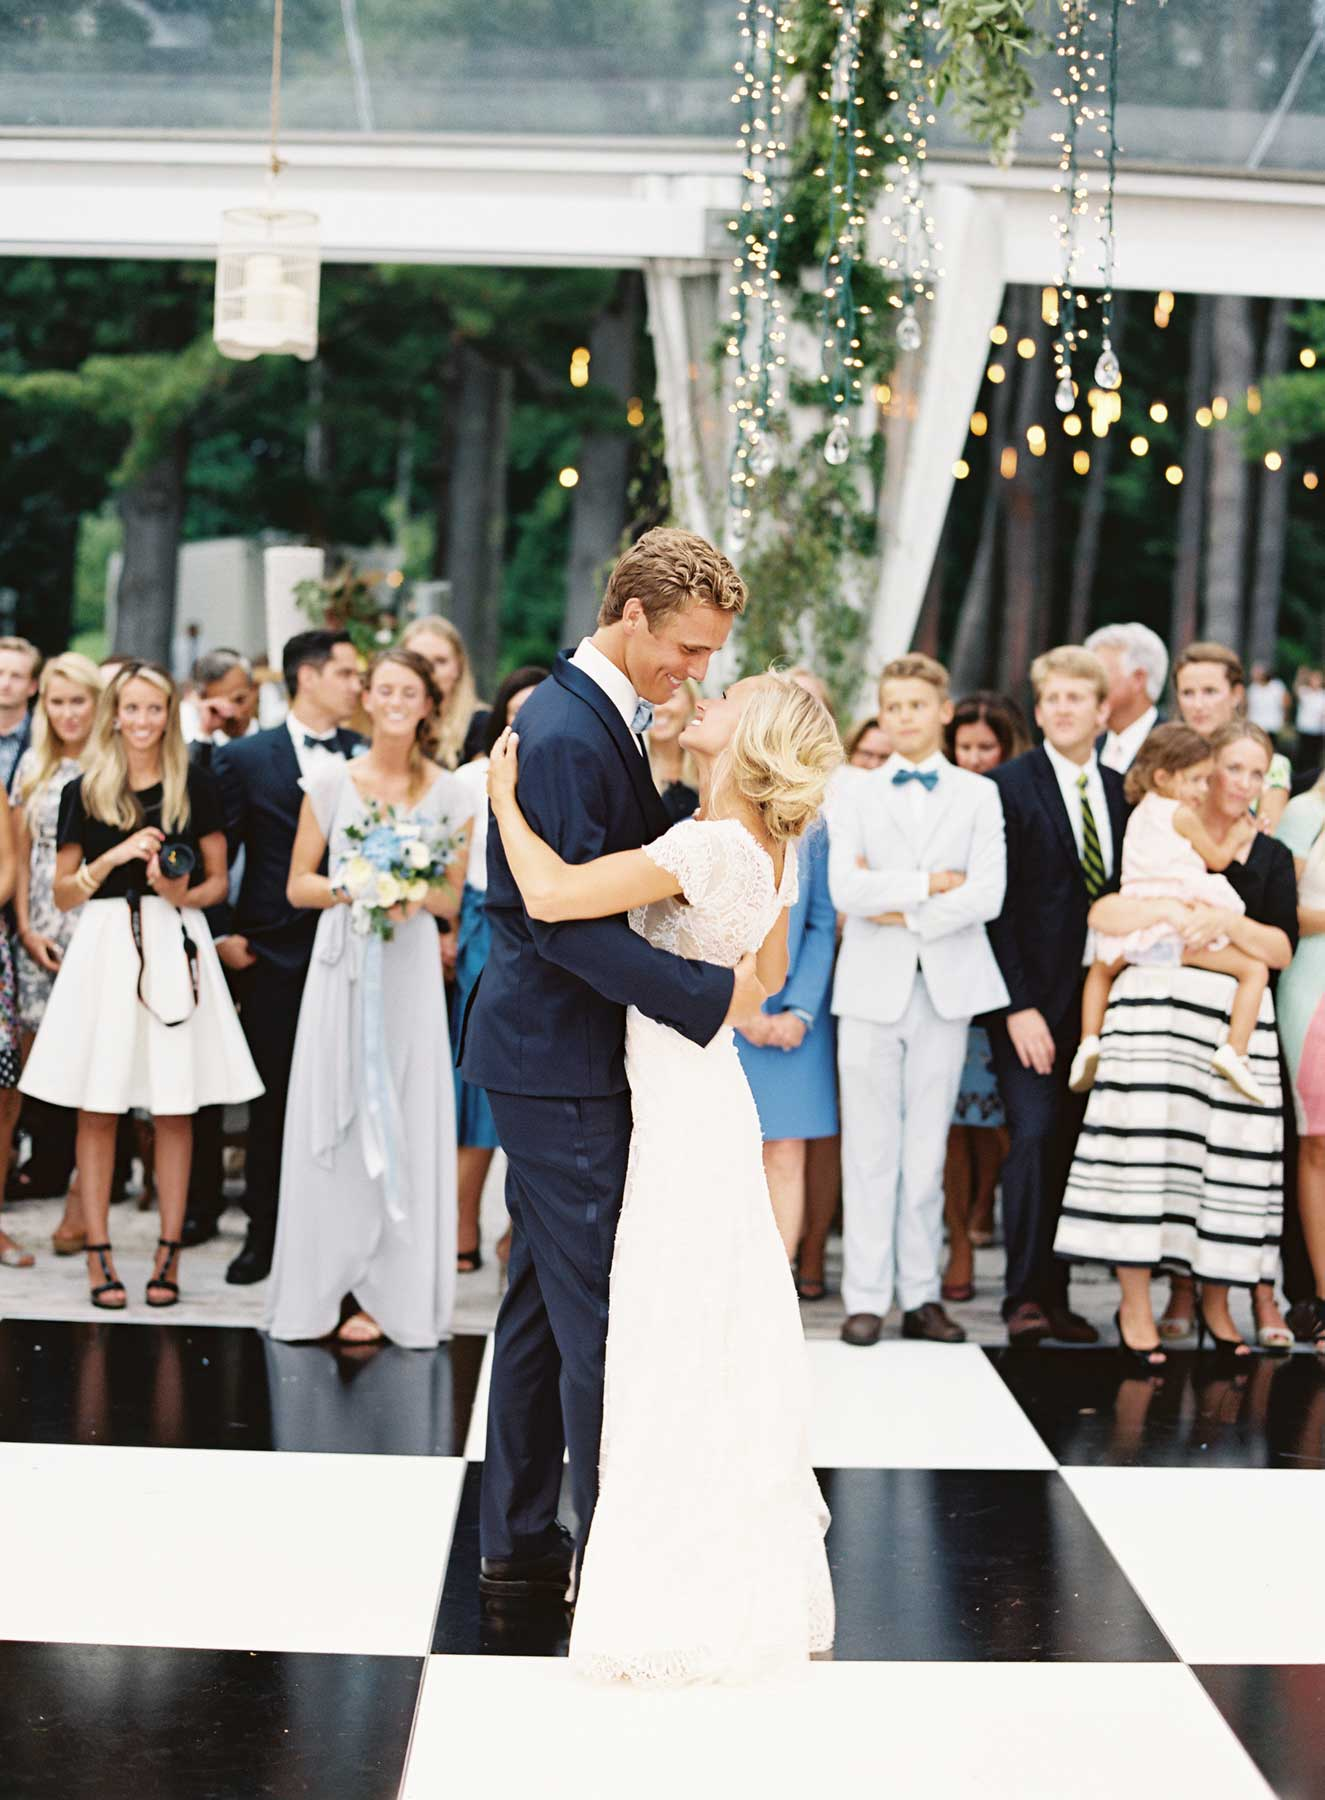 bride and groom first dance checkerboard dance floor 2019 popular real weddings